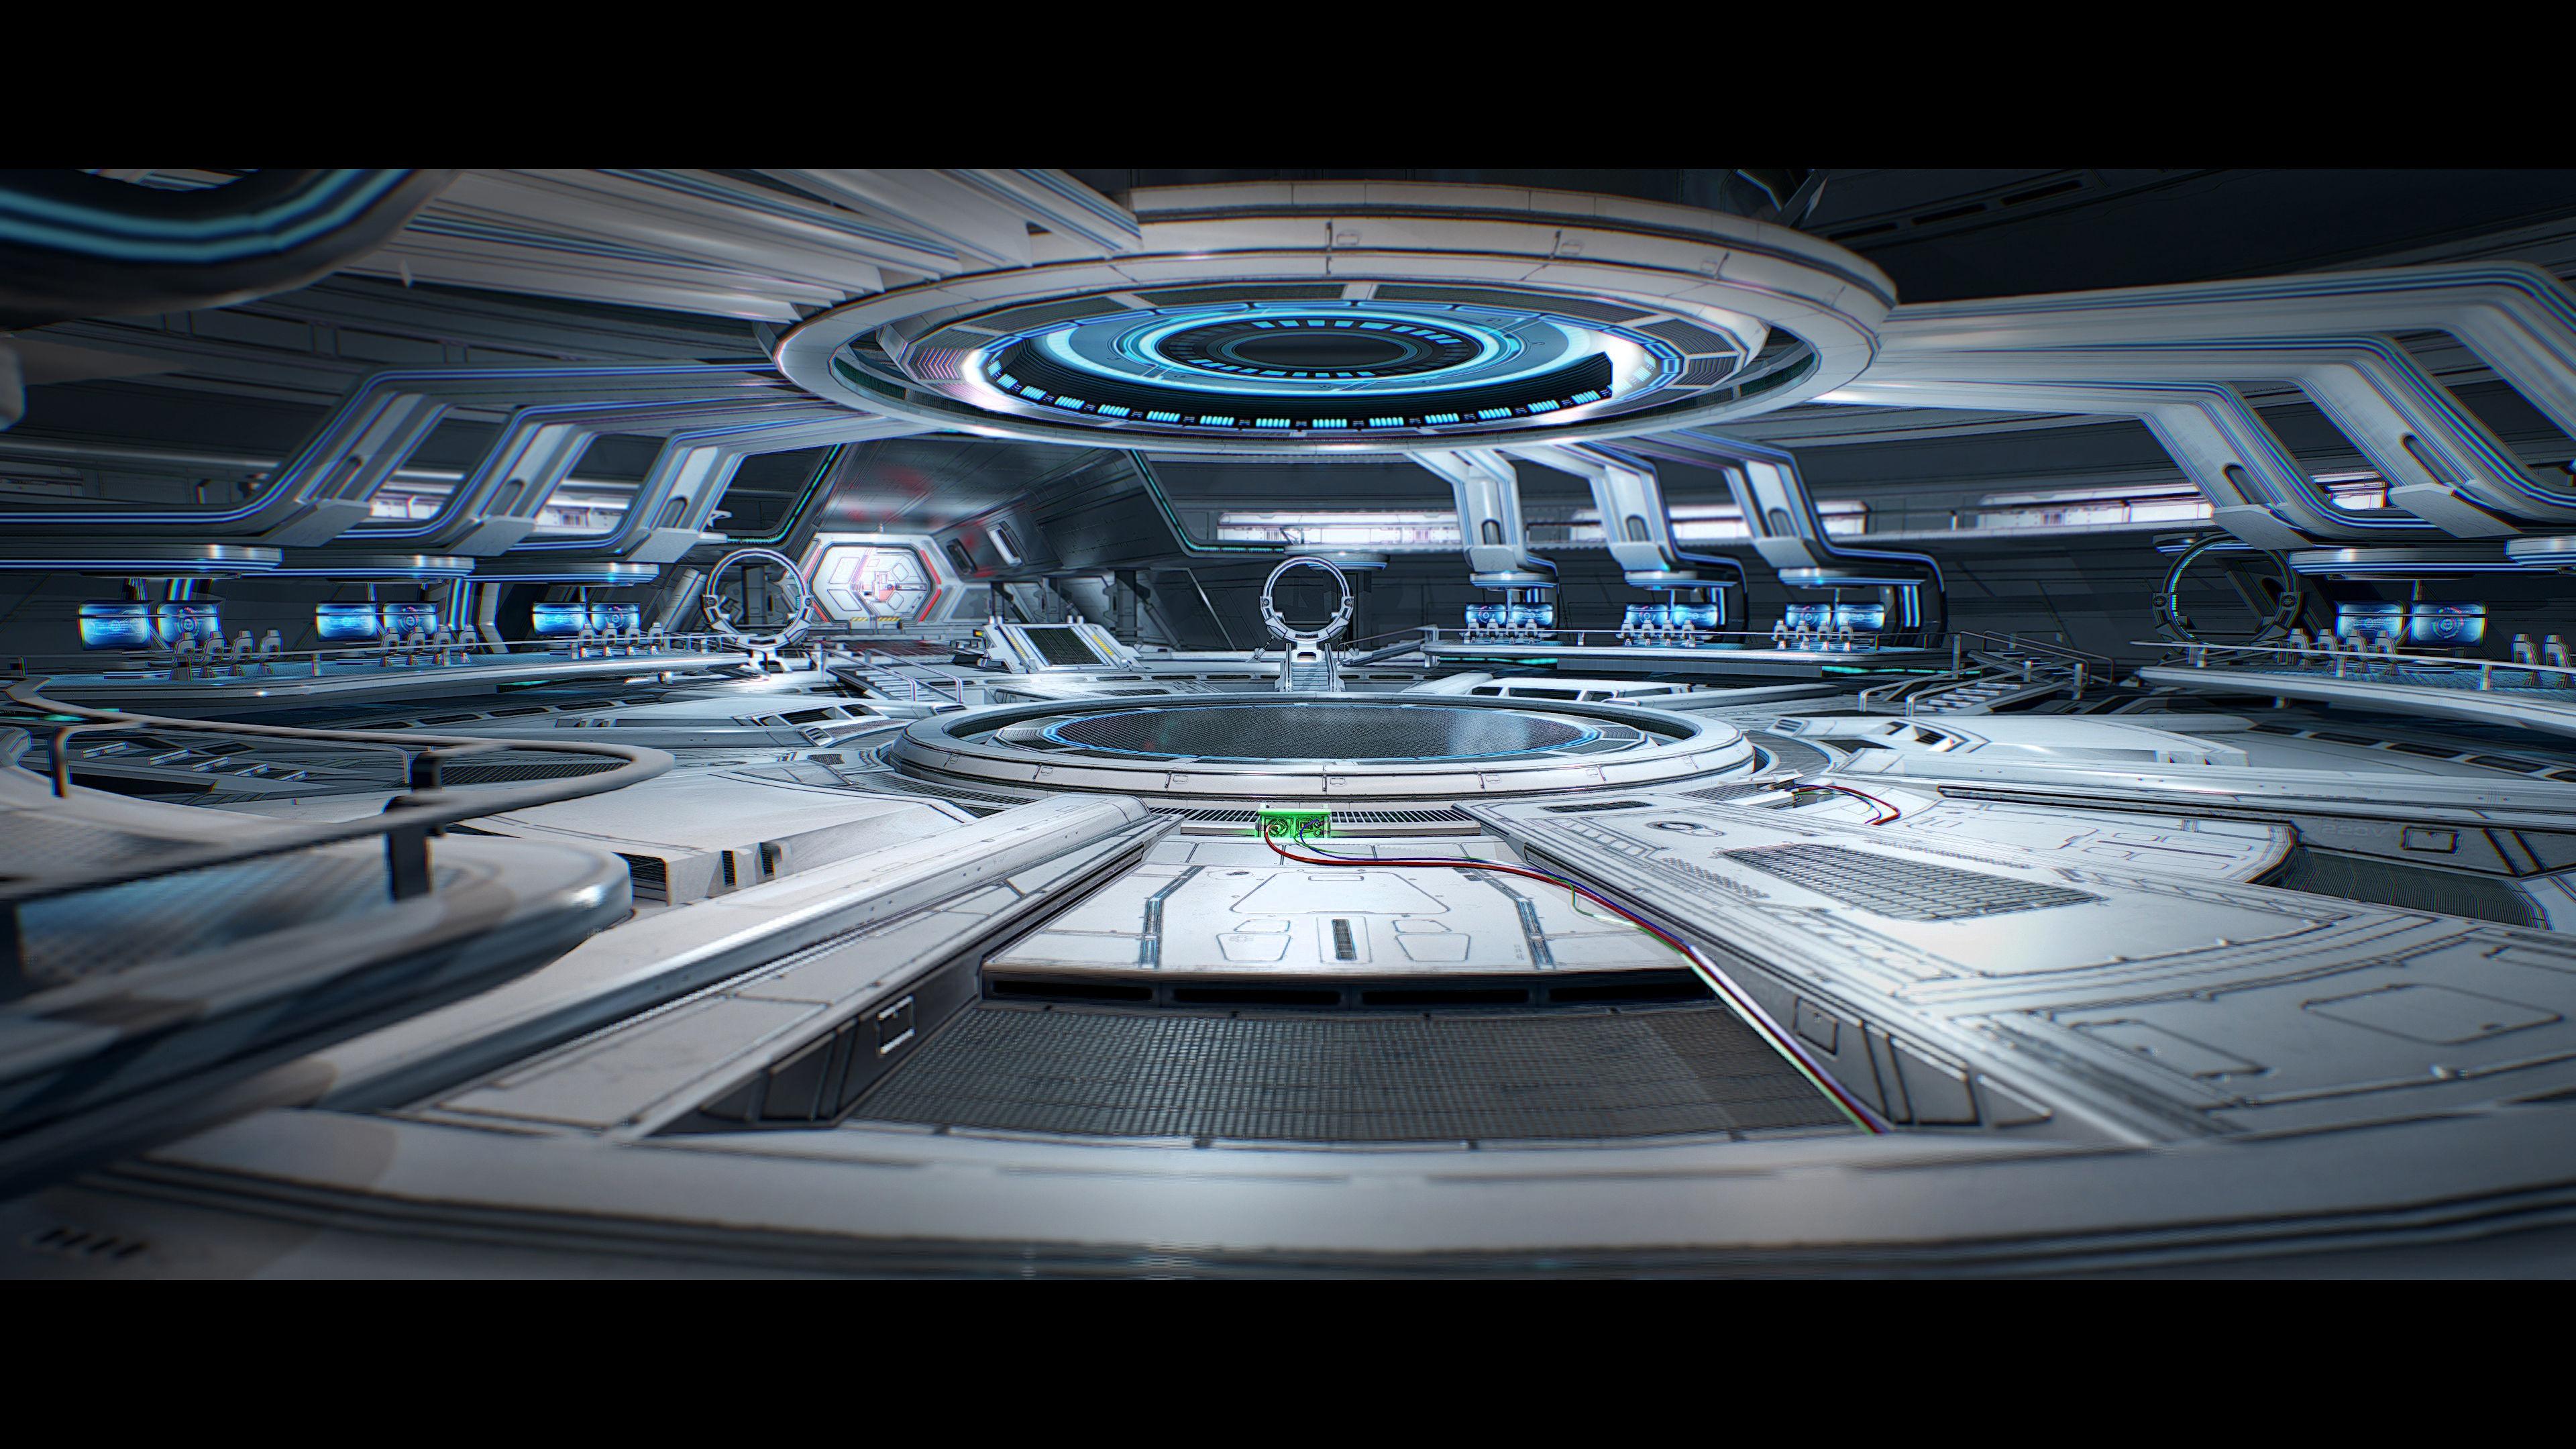 3D Sci Fi Hangar Interior  game ready  optimized for  camera